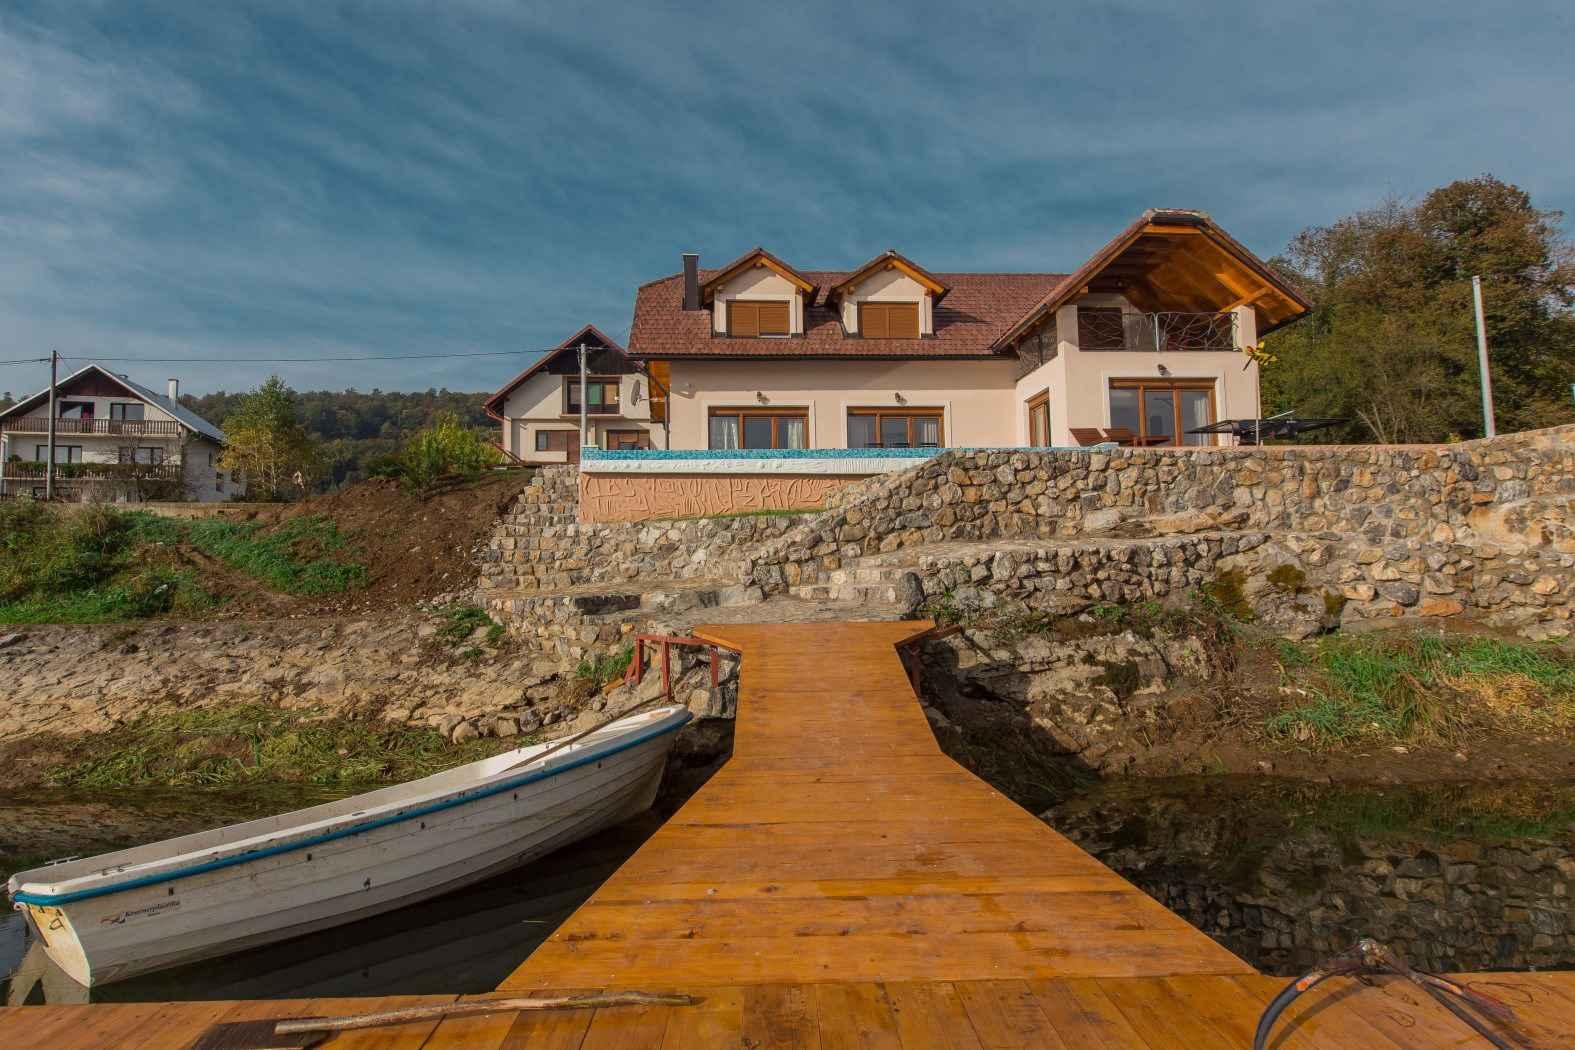 Ferienhaus mit Pool am See gelegen (2047240), Ogulin, , Mittelkroatien, Kroatien, Bild 7